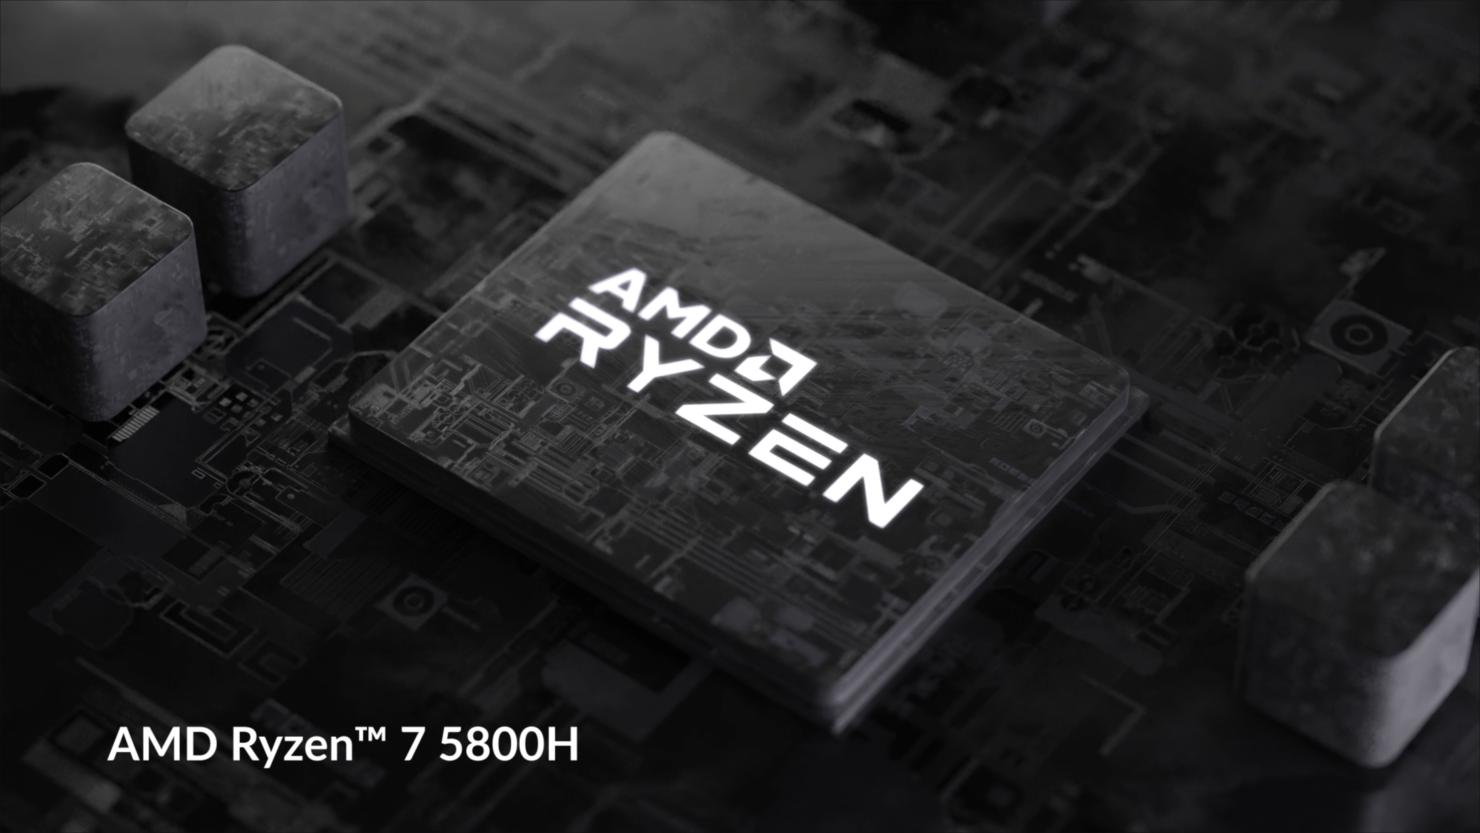 tachy-vortex-15-gaming-laptop-with-amd-ryzen-7-5800h-zen-3-cpu-nvidia-geforce-rtx-3060-6-gb-max-p-mobility-gpu-_5